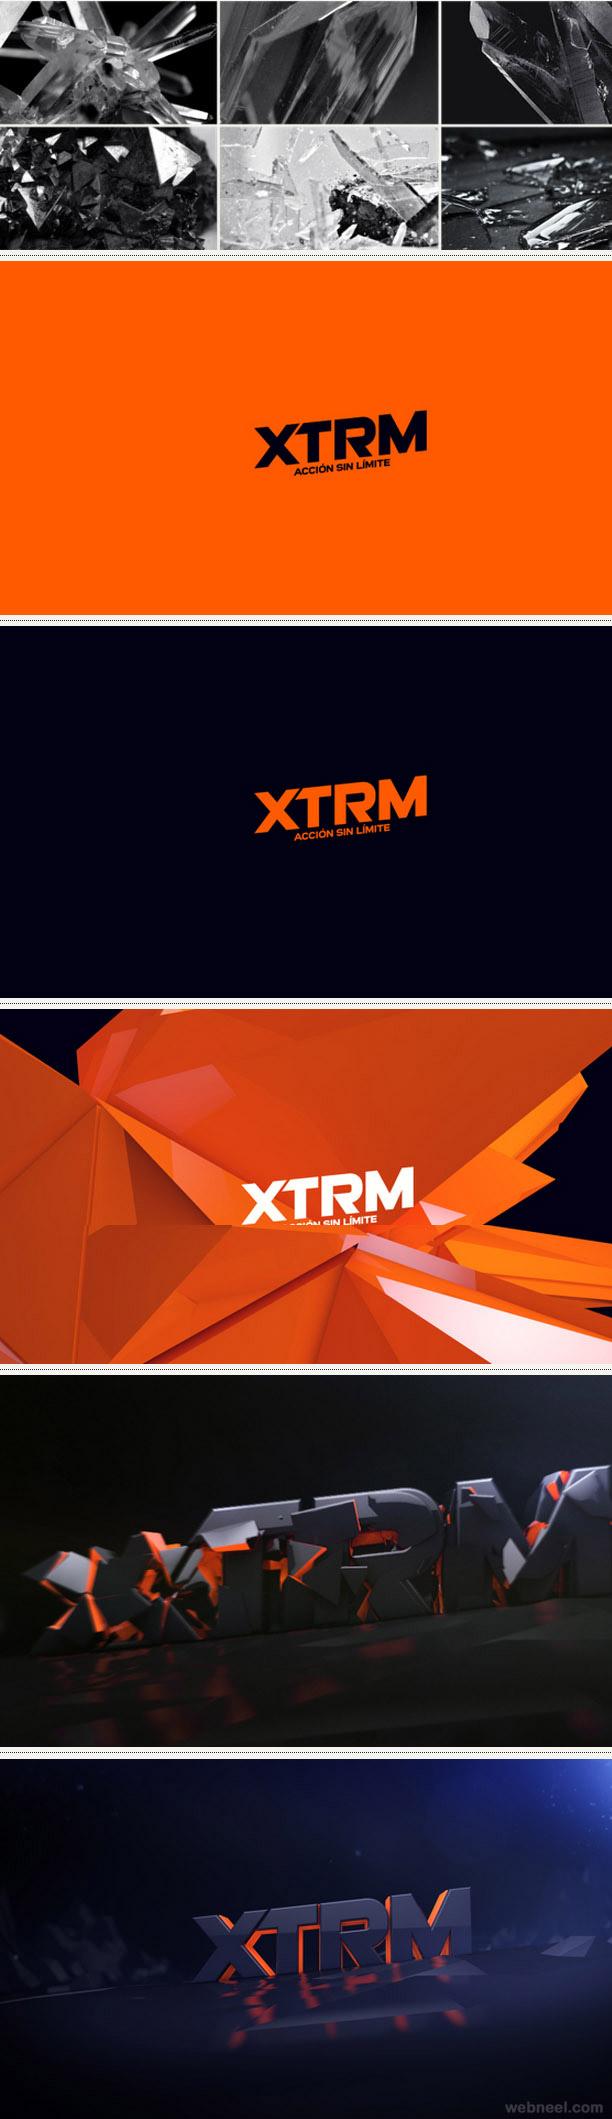 xtrm channel rebranding identity design